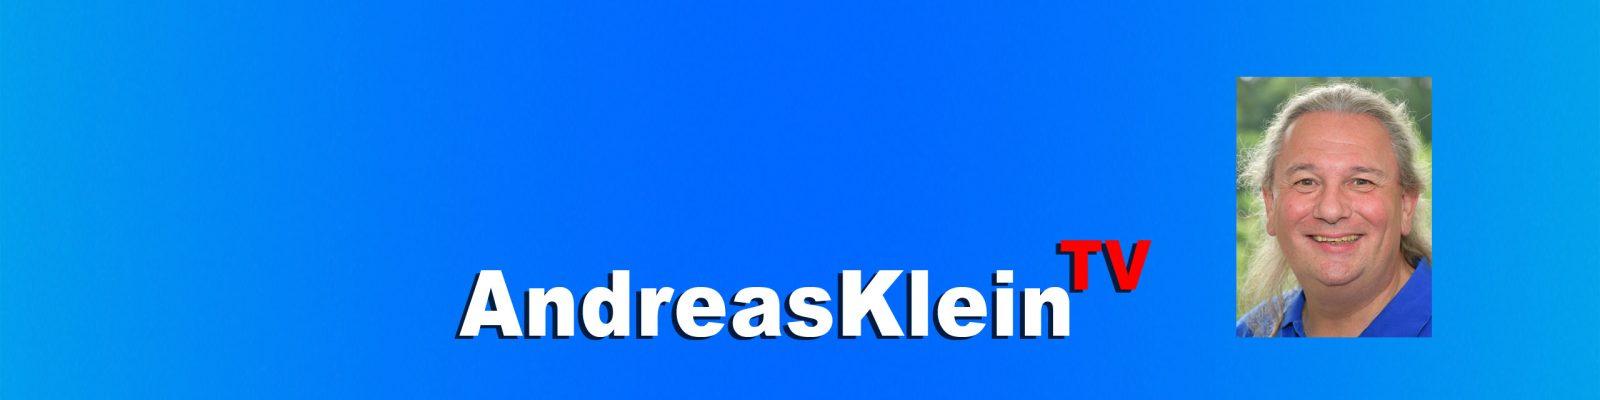 Andreas Klein TV